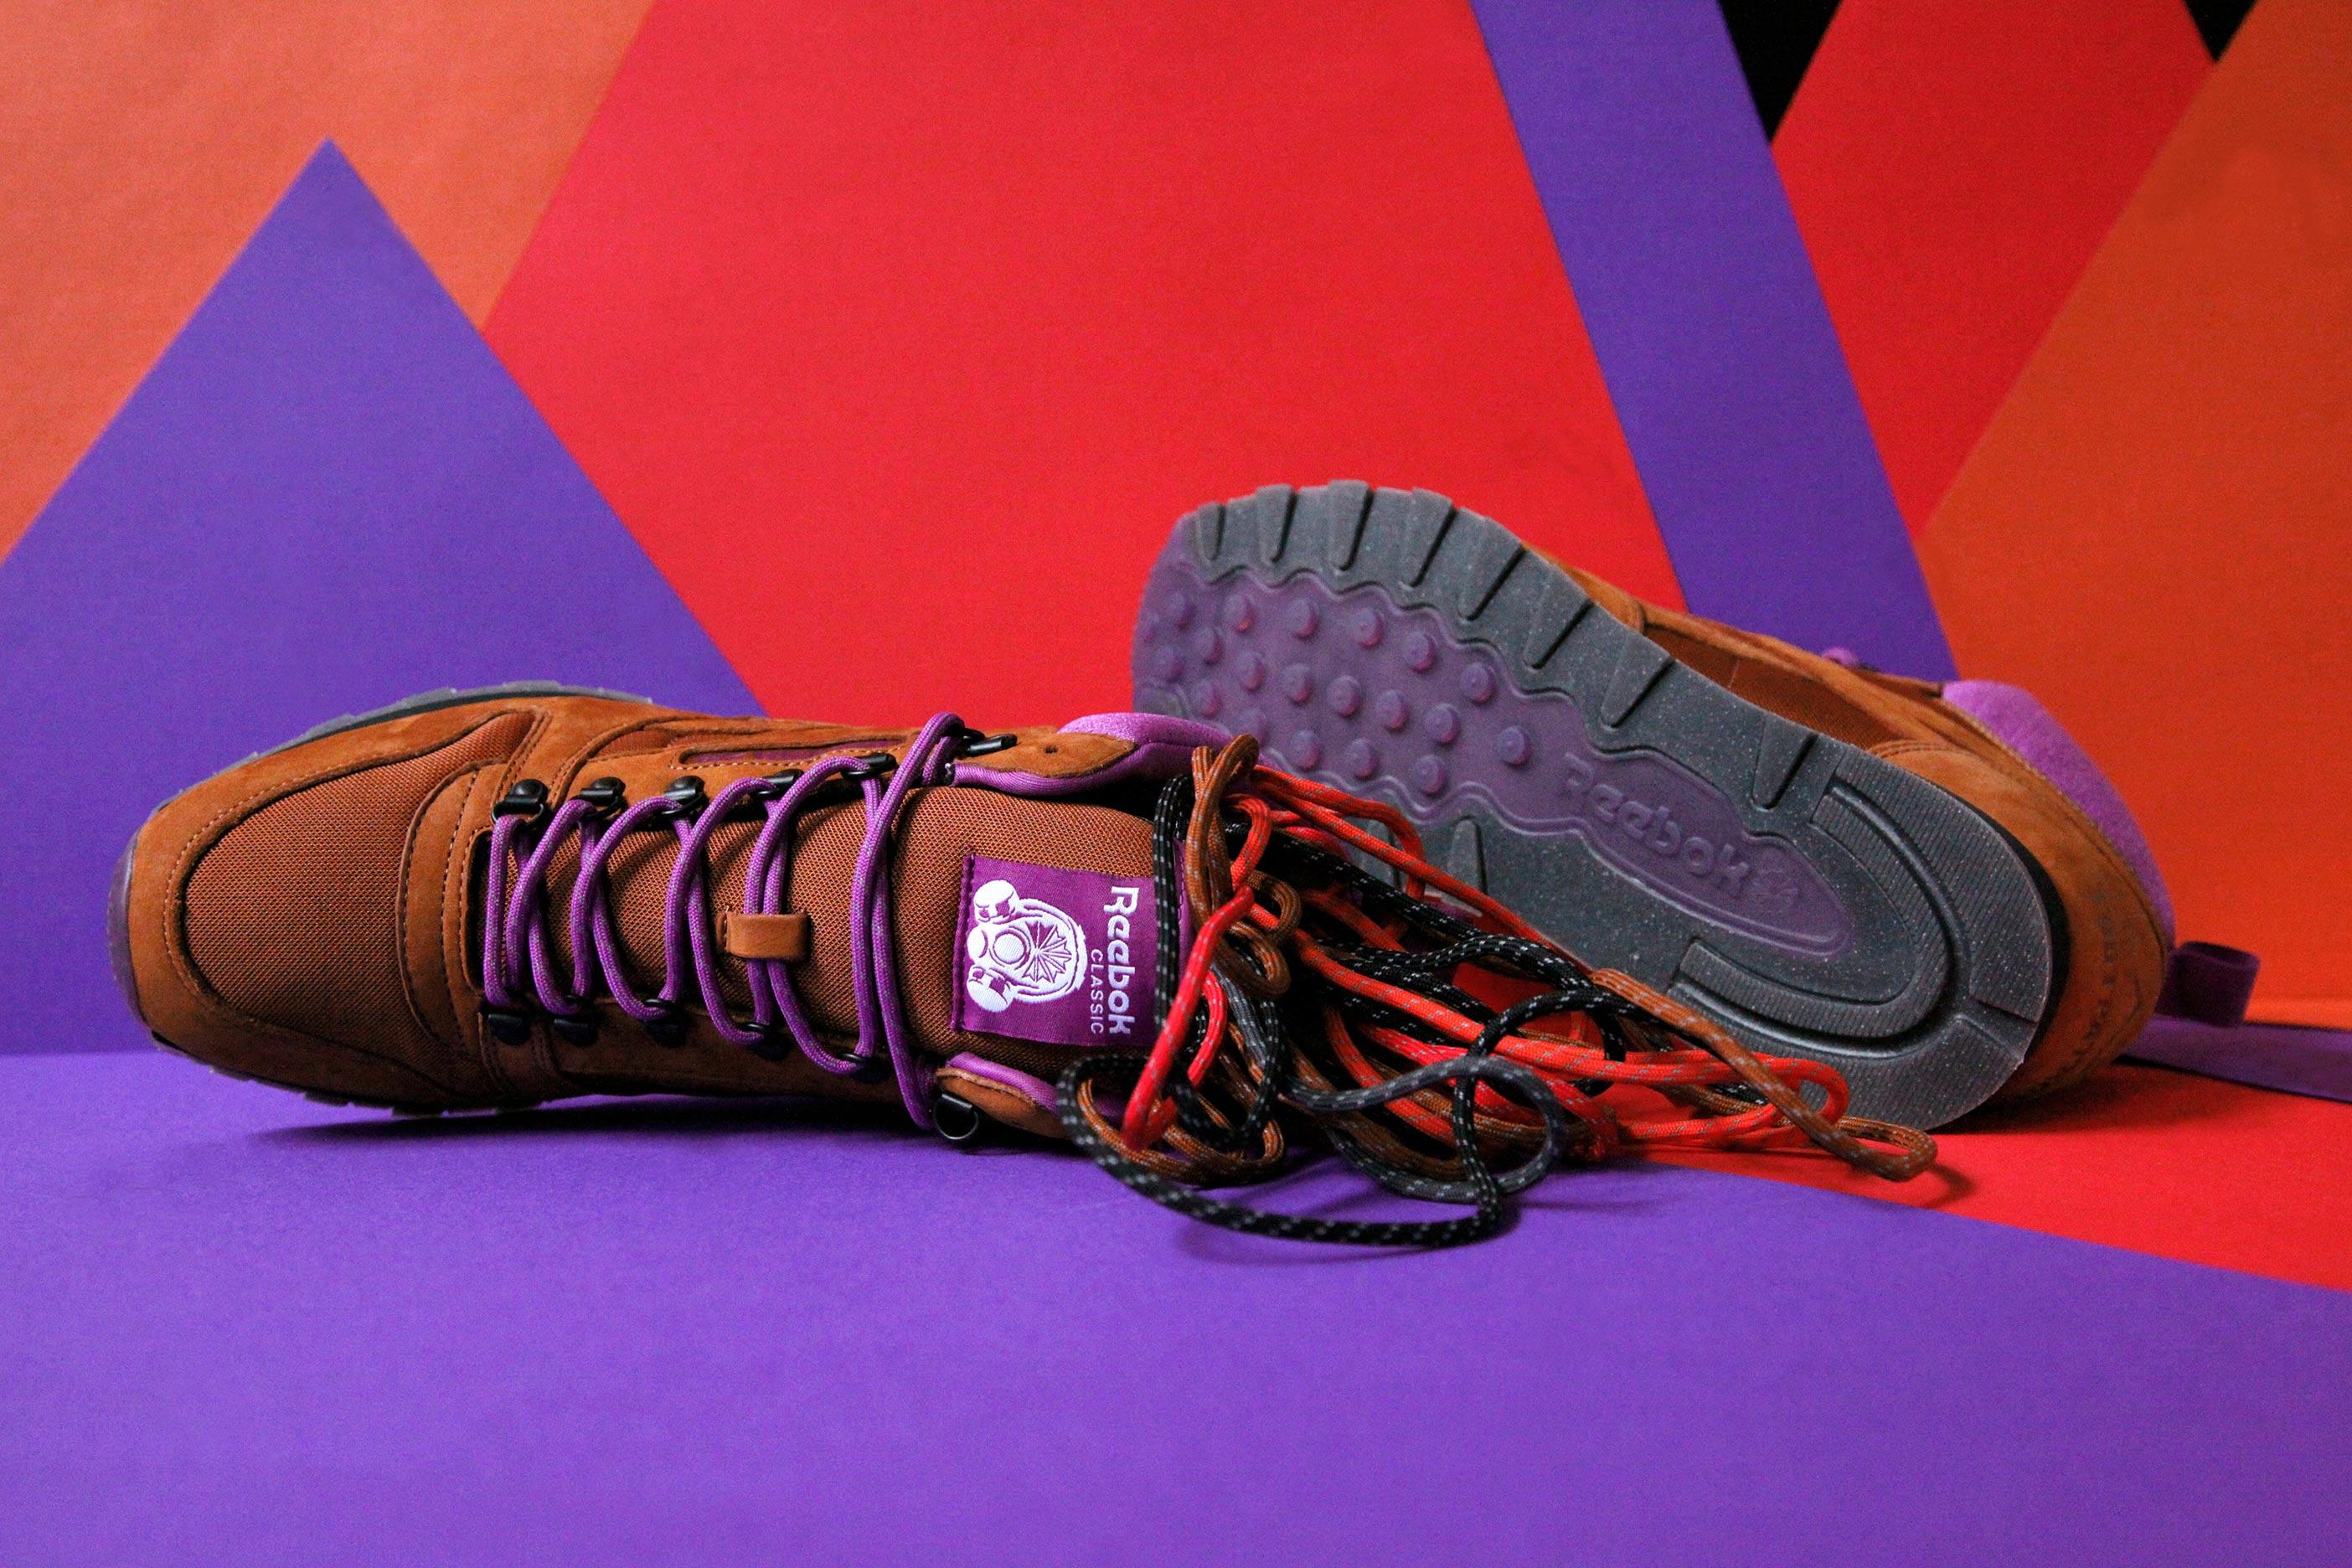 foot-patrol-reebok-classic-leather-mid-on-the-rocks-12